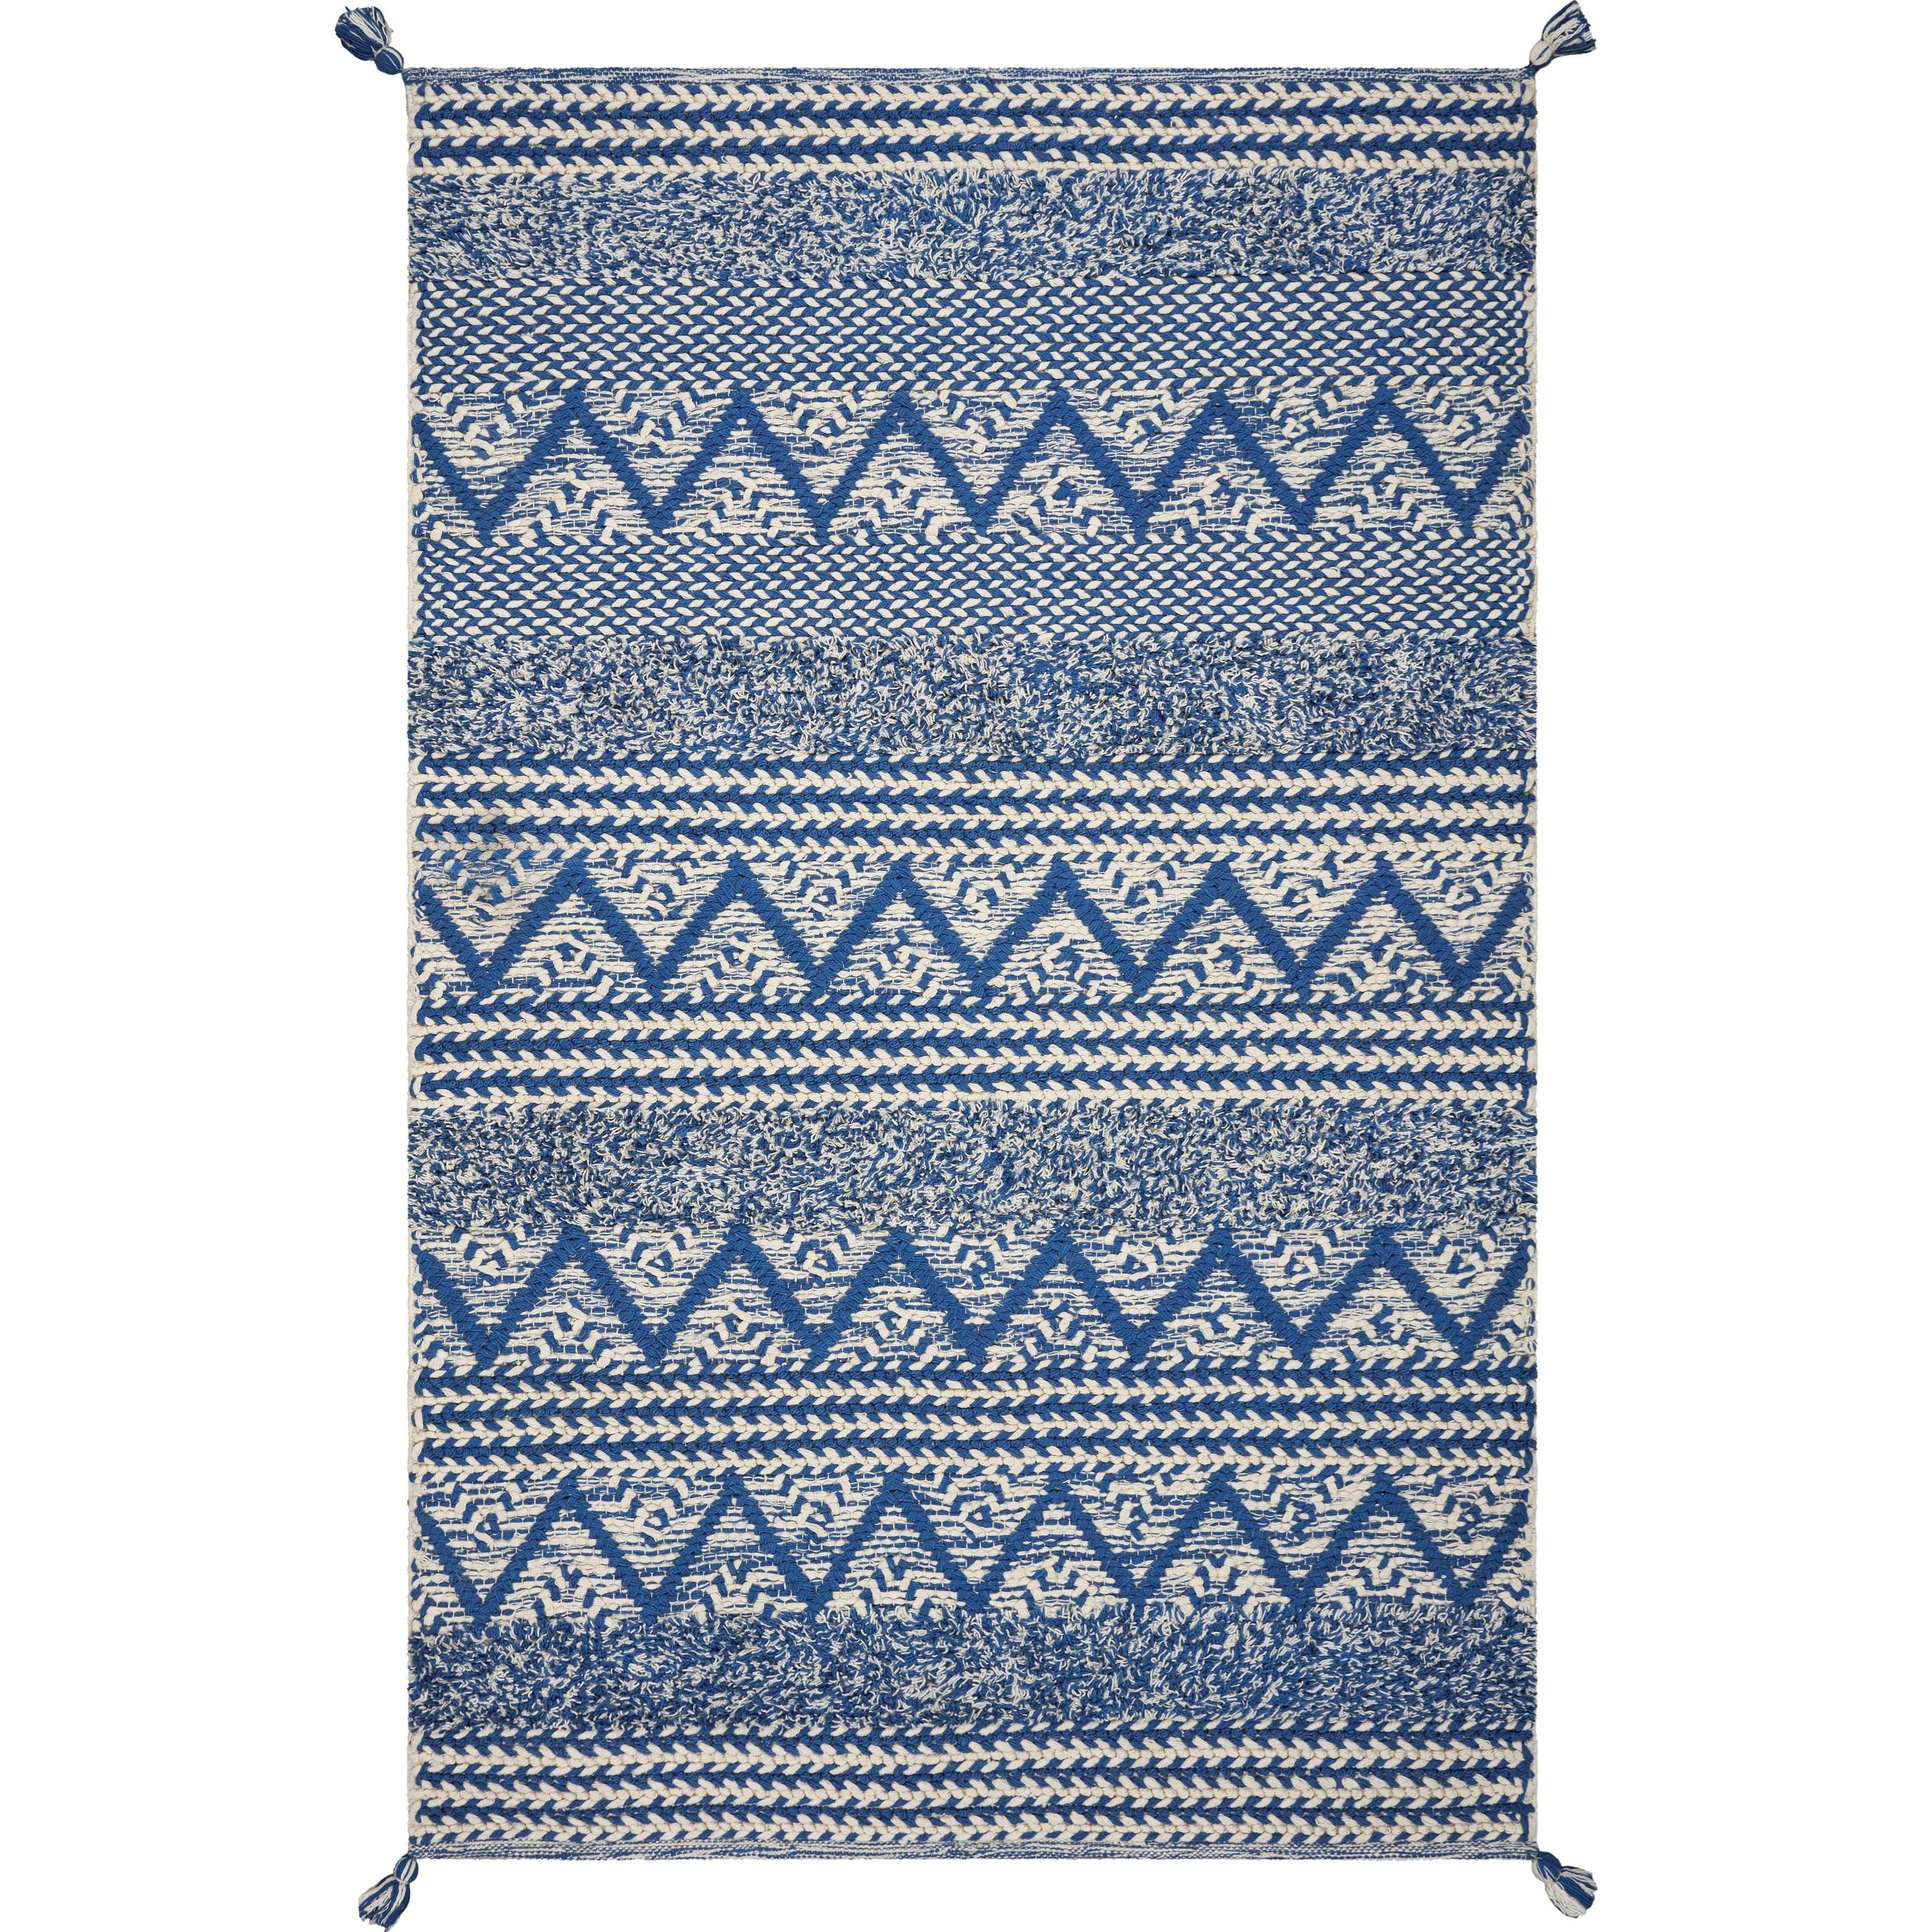 6' x 9' Blue Hermosa Beach Rug